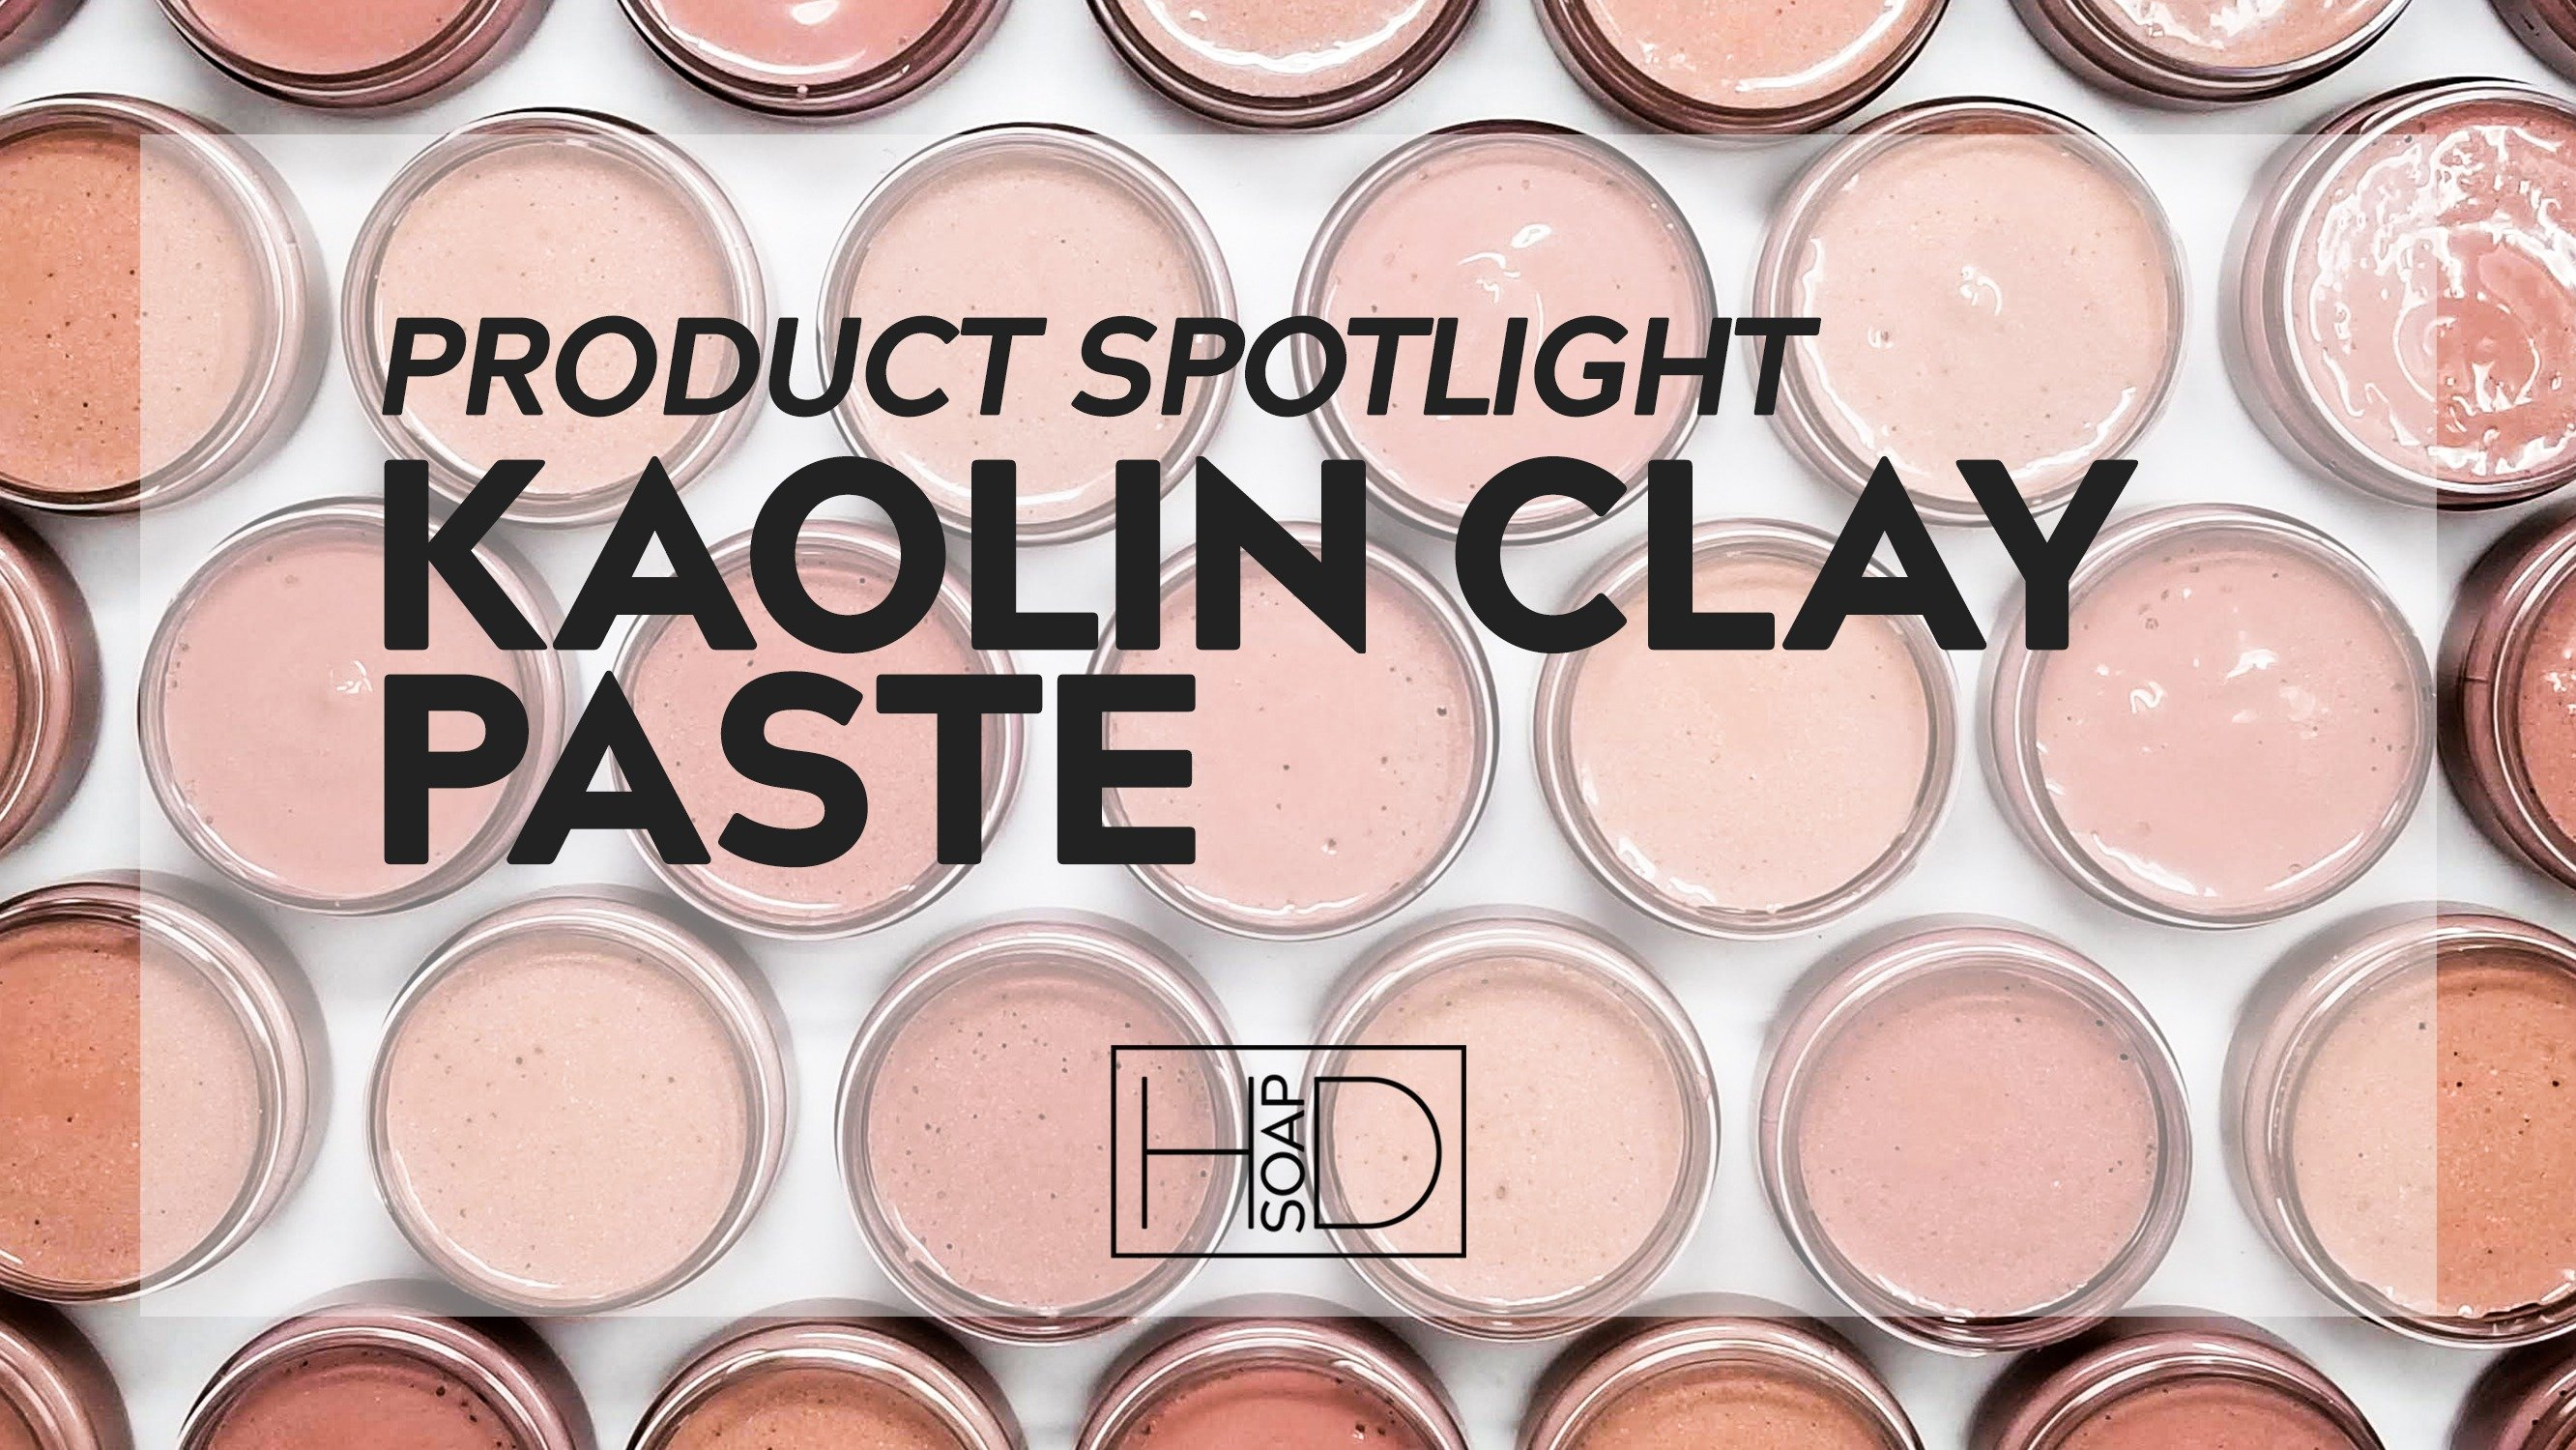 HD Soap | Kaolin Clay Paste